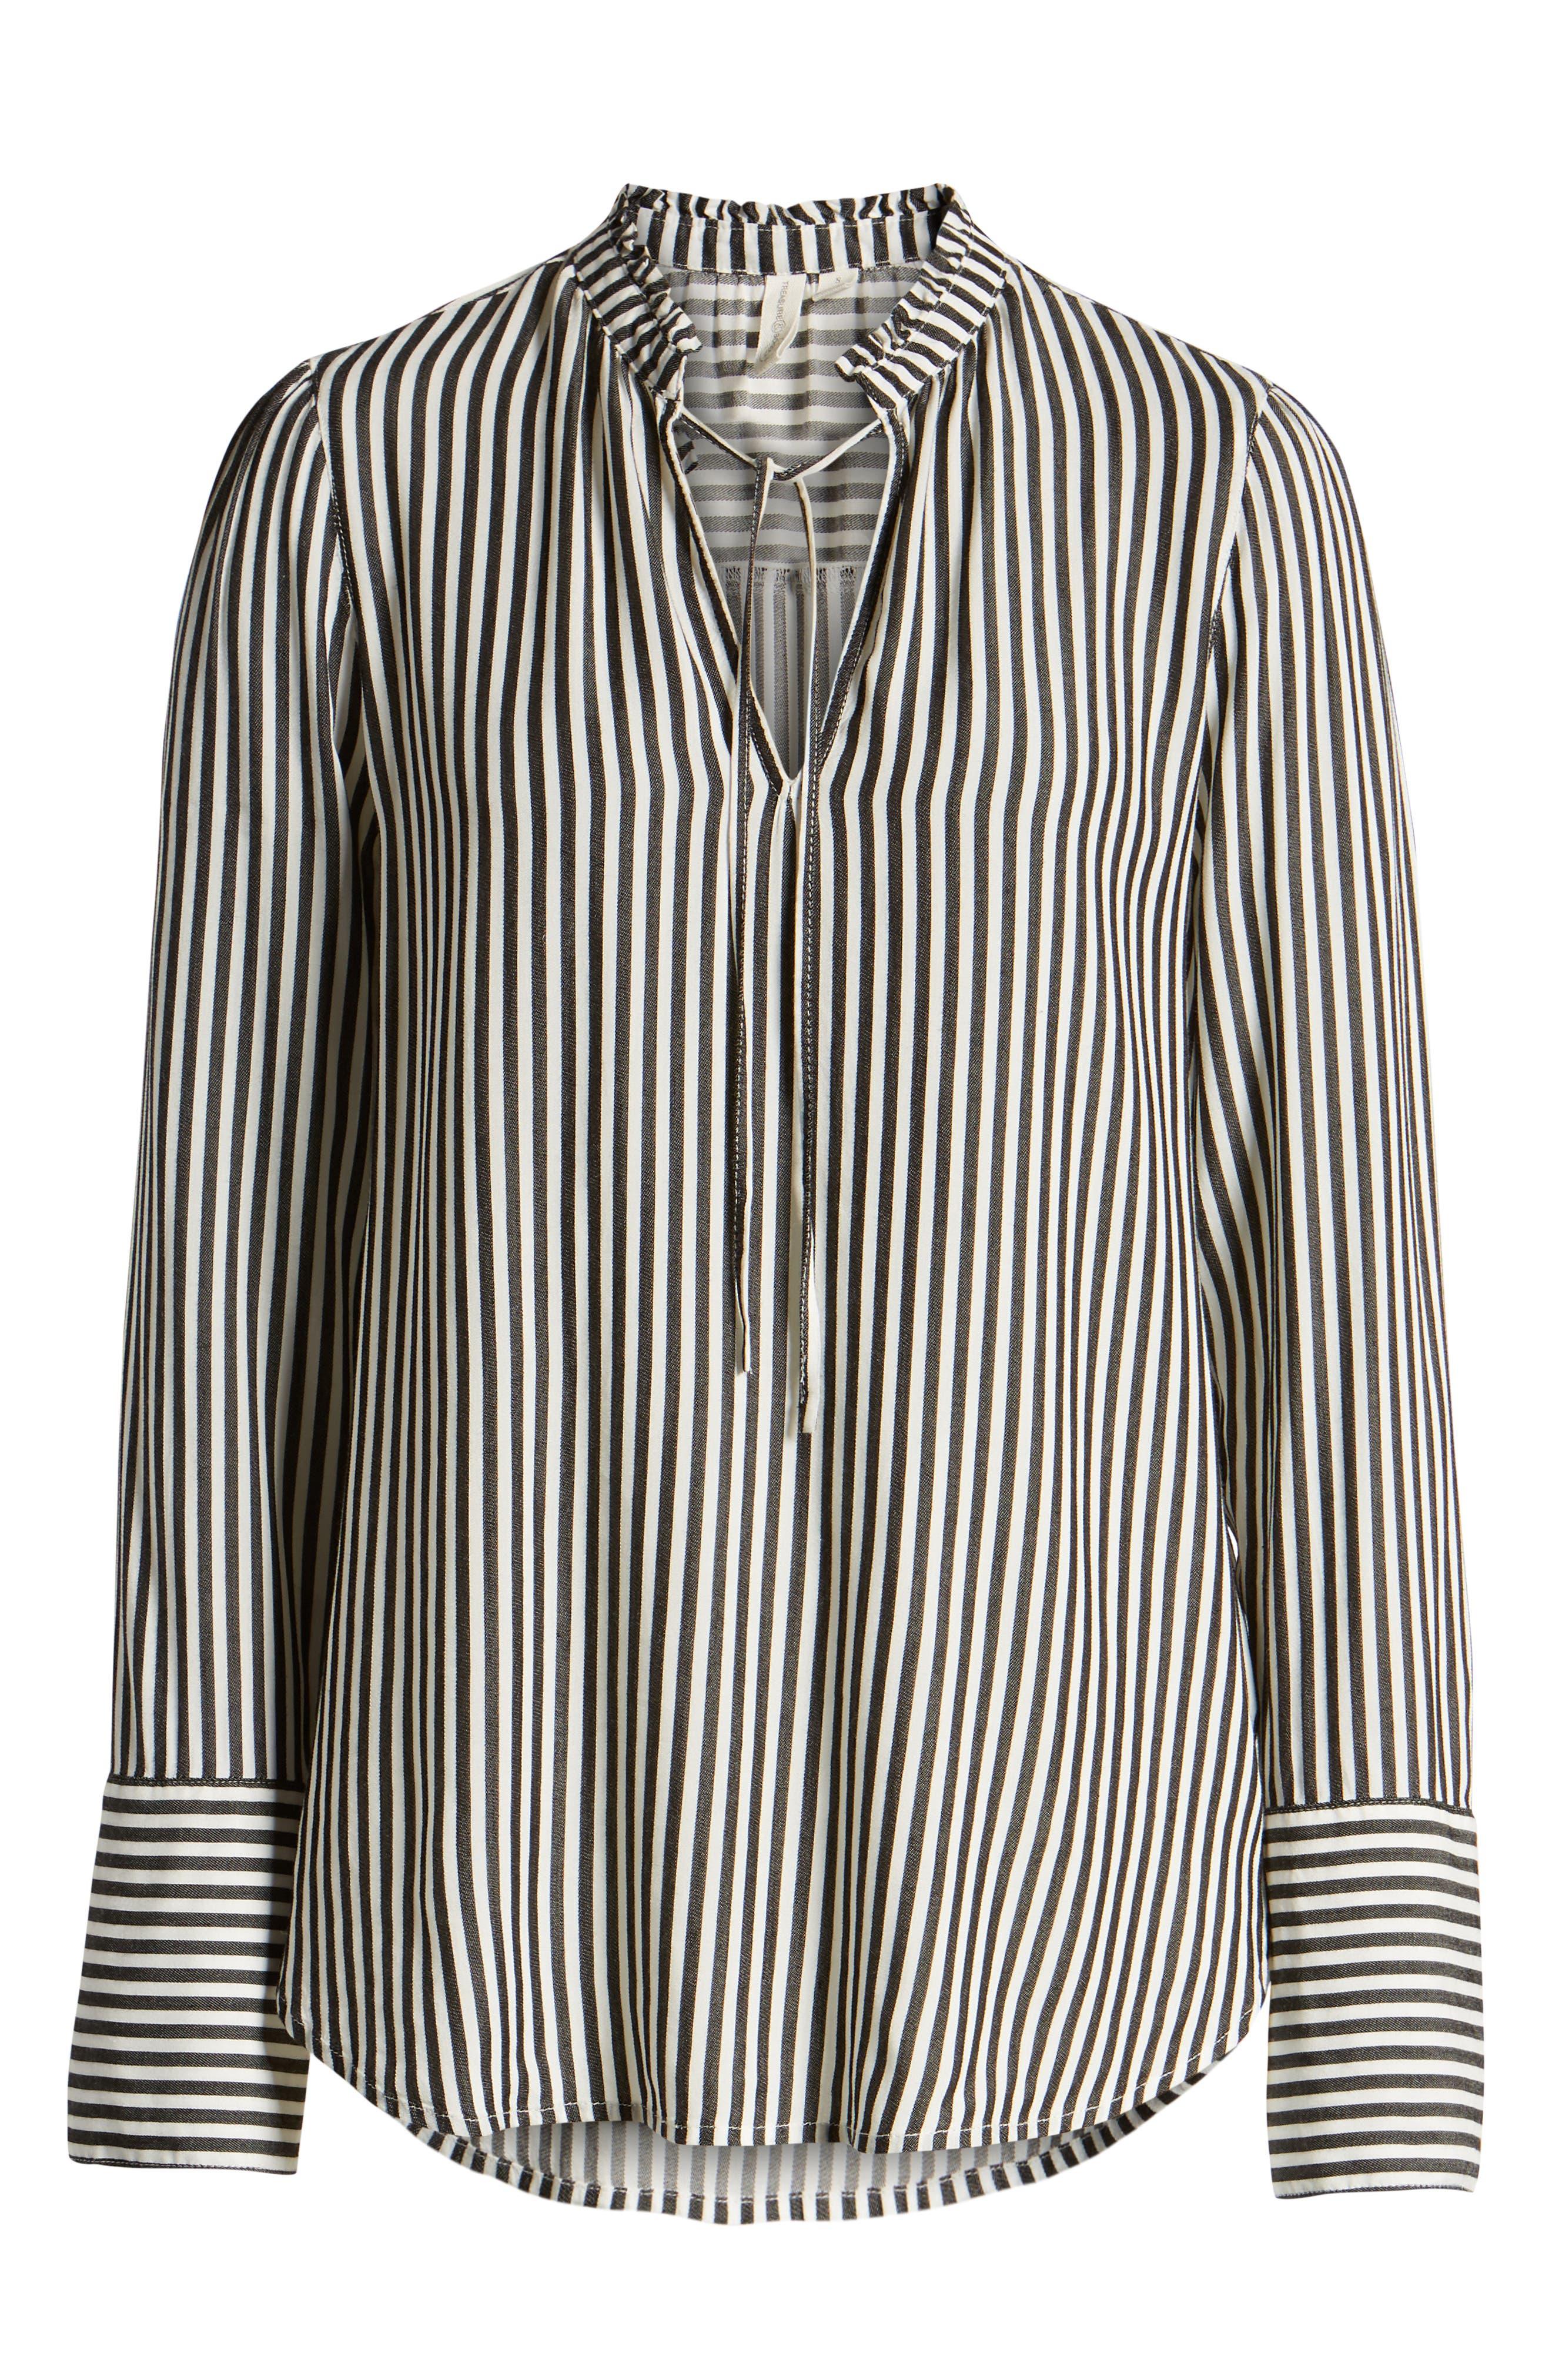 TREASURE & BOND, Stripe Ruffle Neck Shirt, Alternate thumbnail 6, color, BLACK- WHITE SARA STRIPE